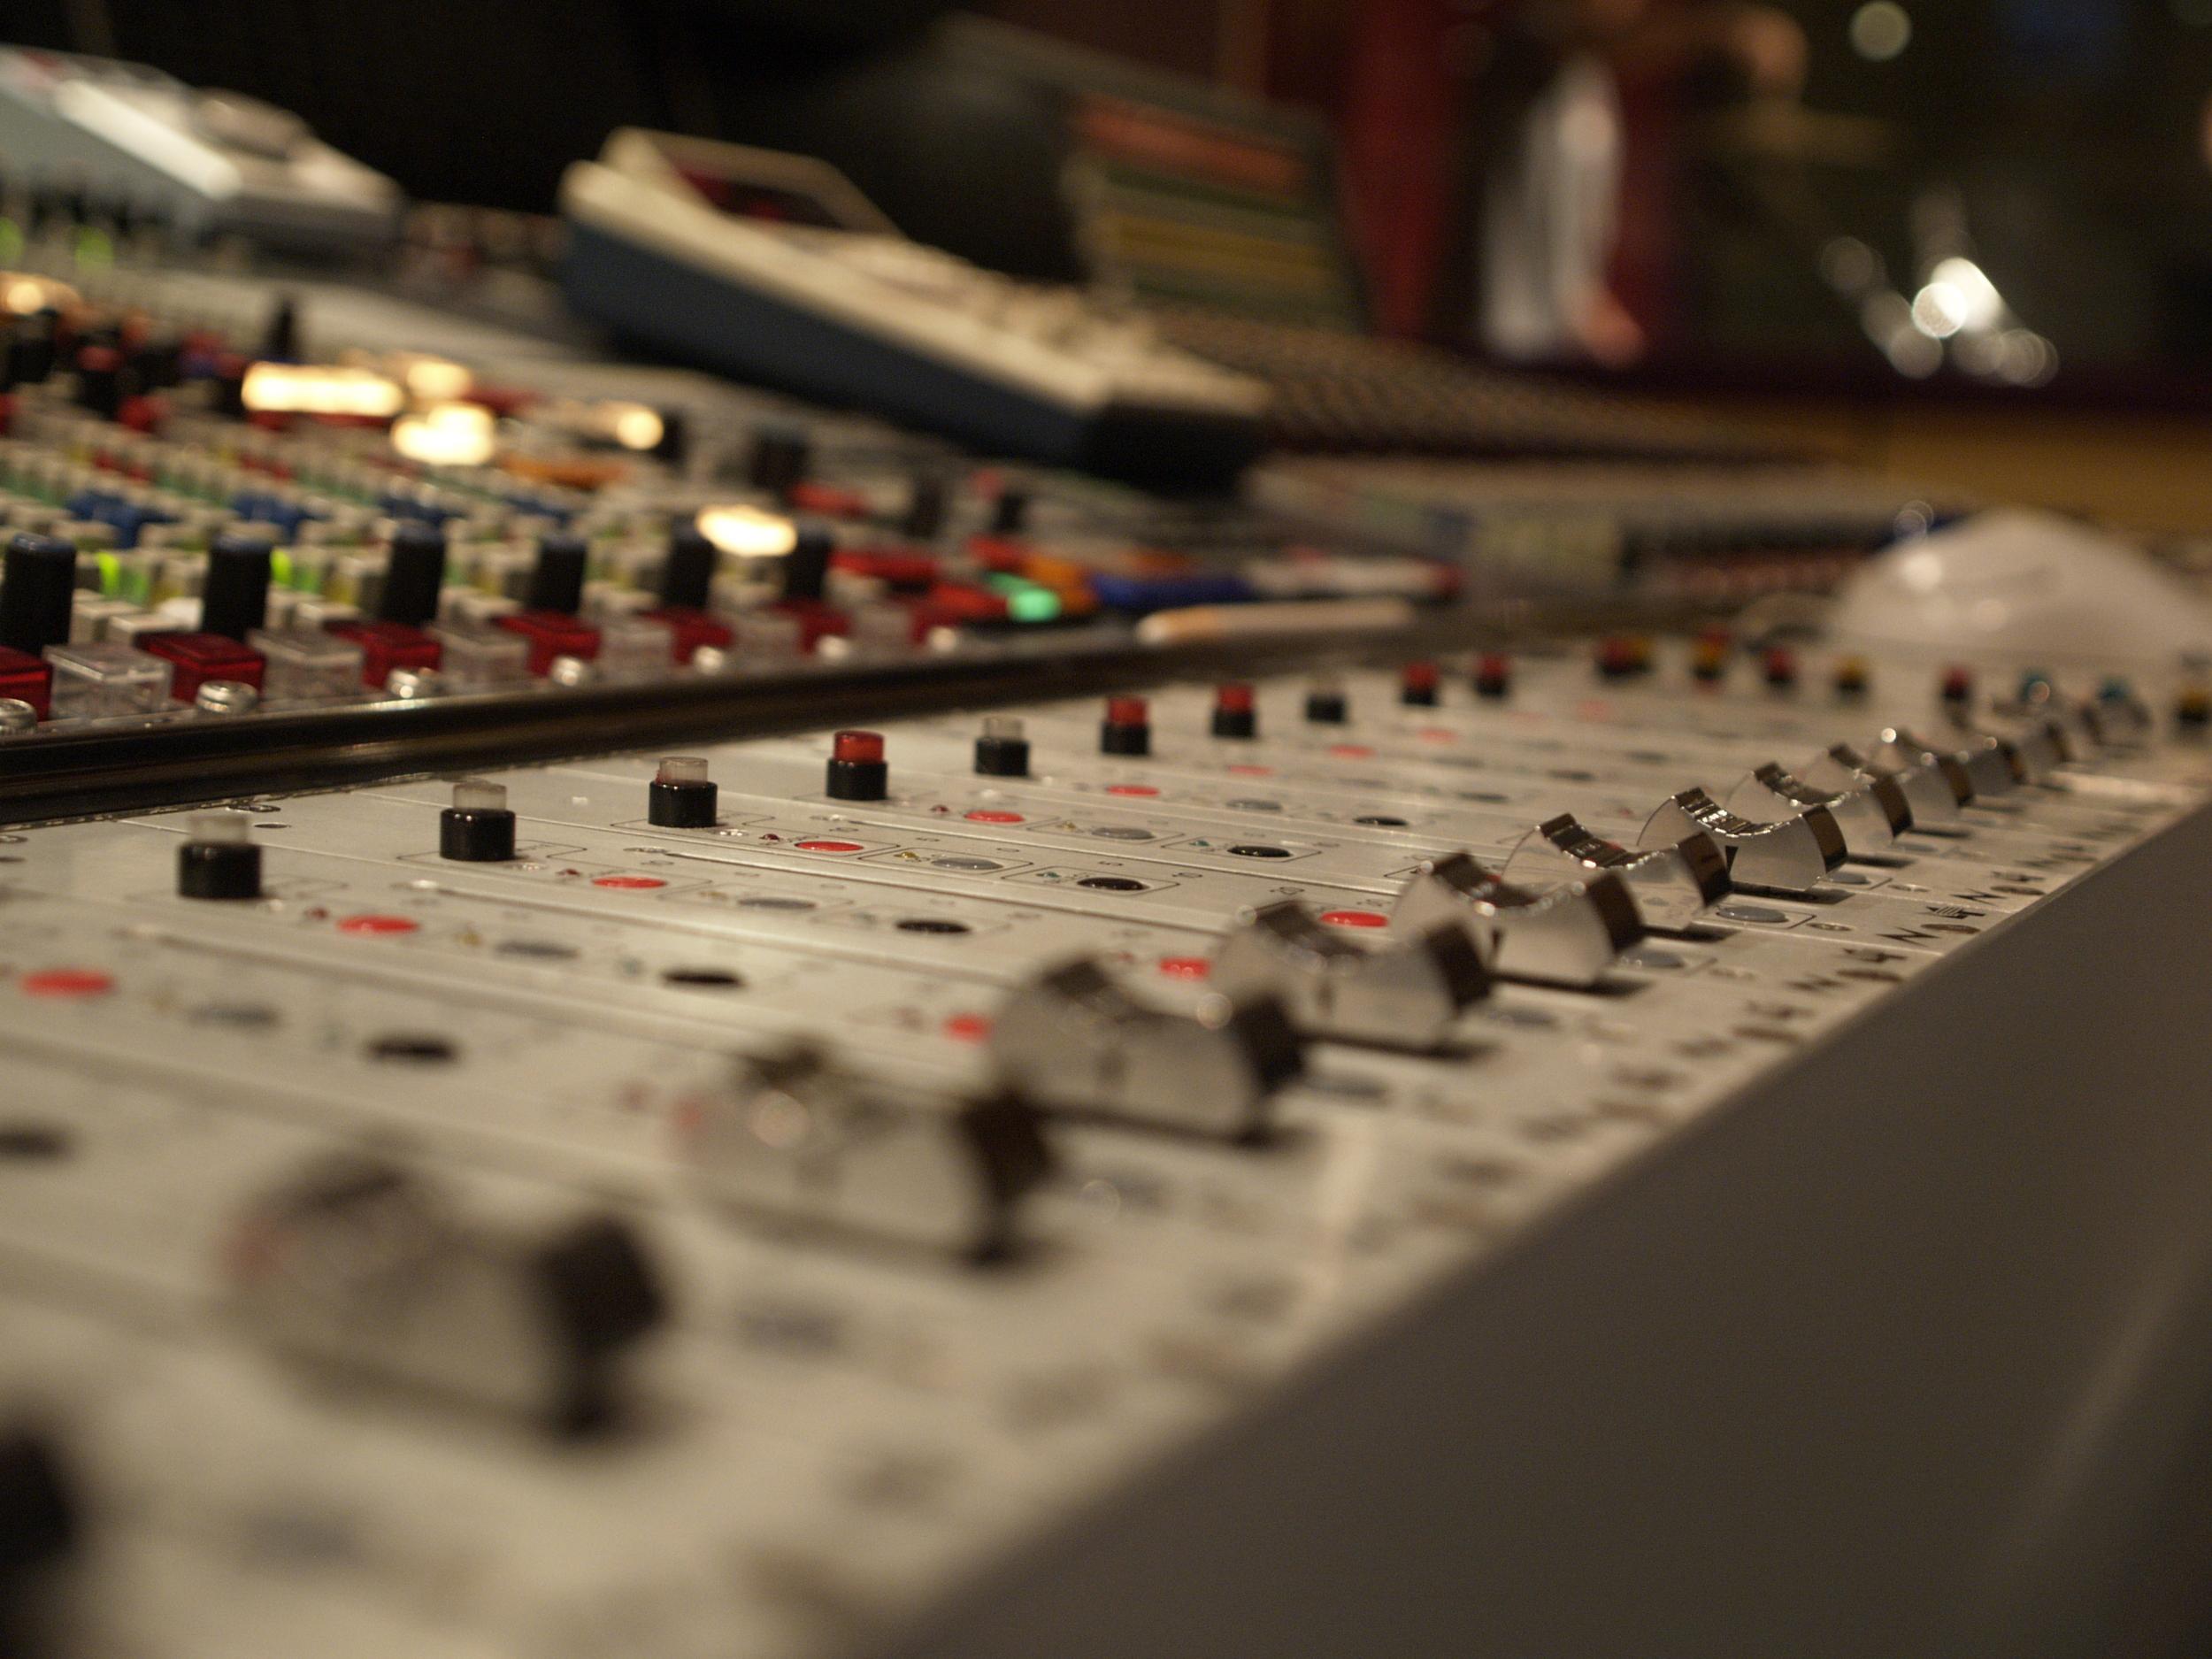 Mixerboard